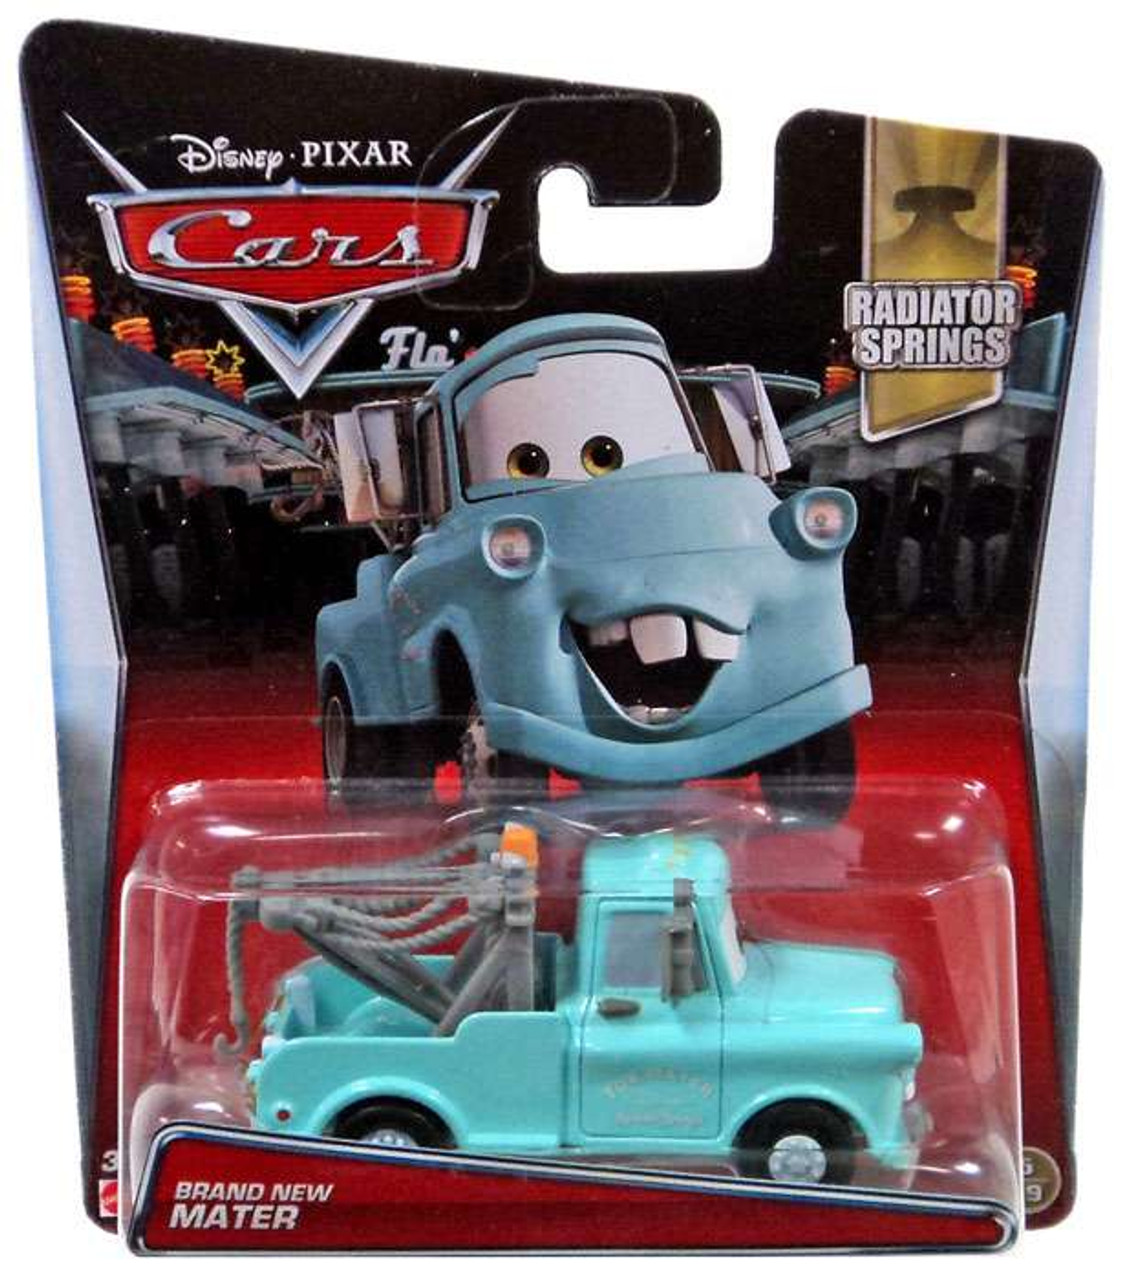 Disney Pixar Cars Radiator Springs Brand New Mater 155 Diecast Car 519  Mattel Toys - ToyWiz